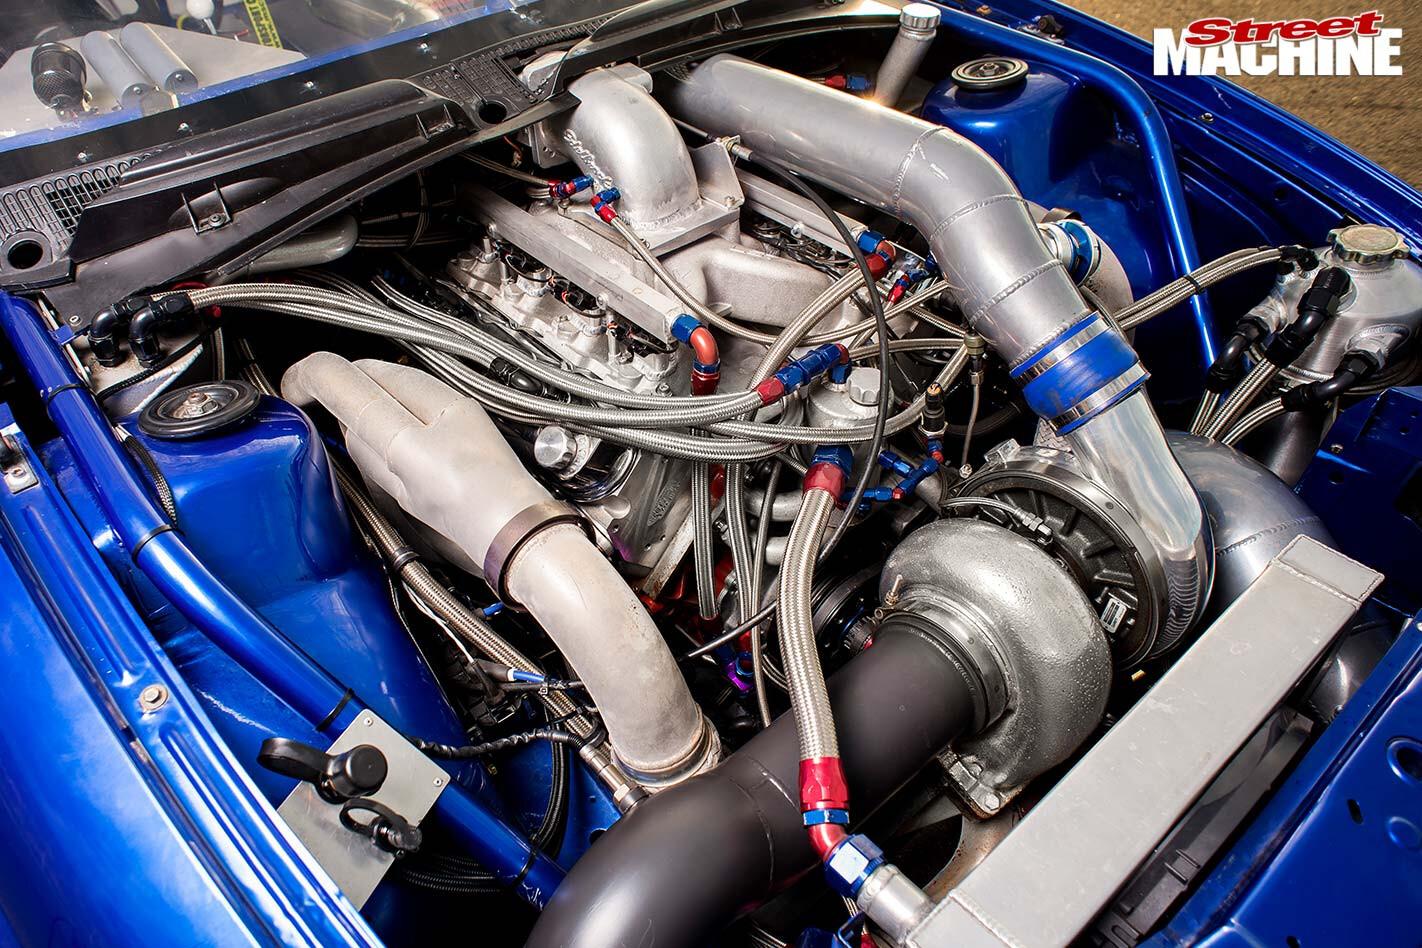 Holden VT Commodore engine bay